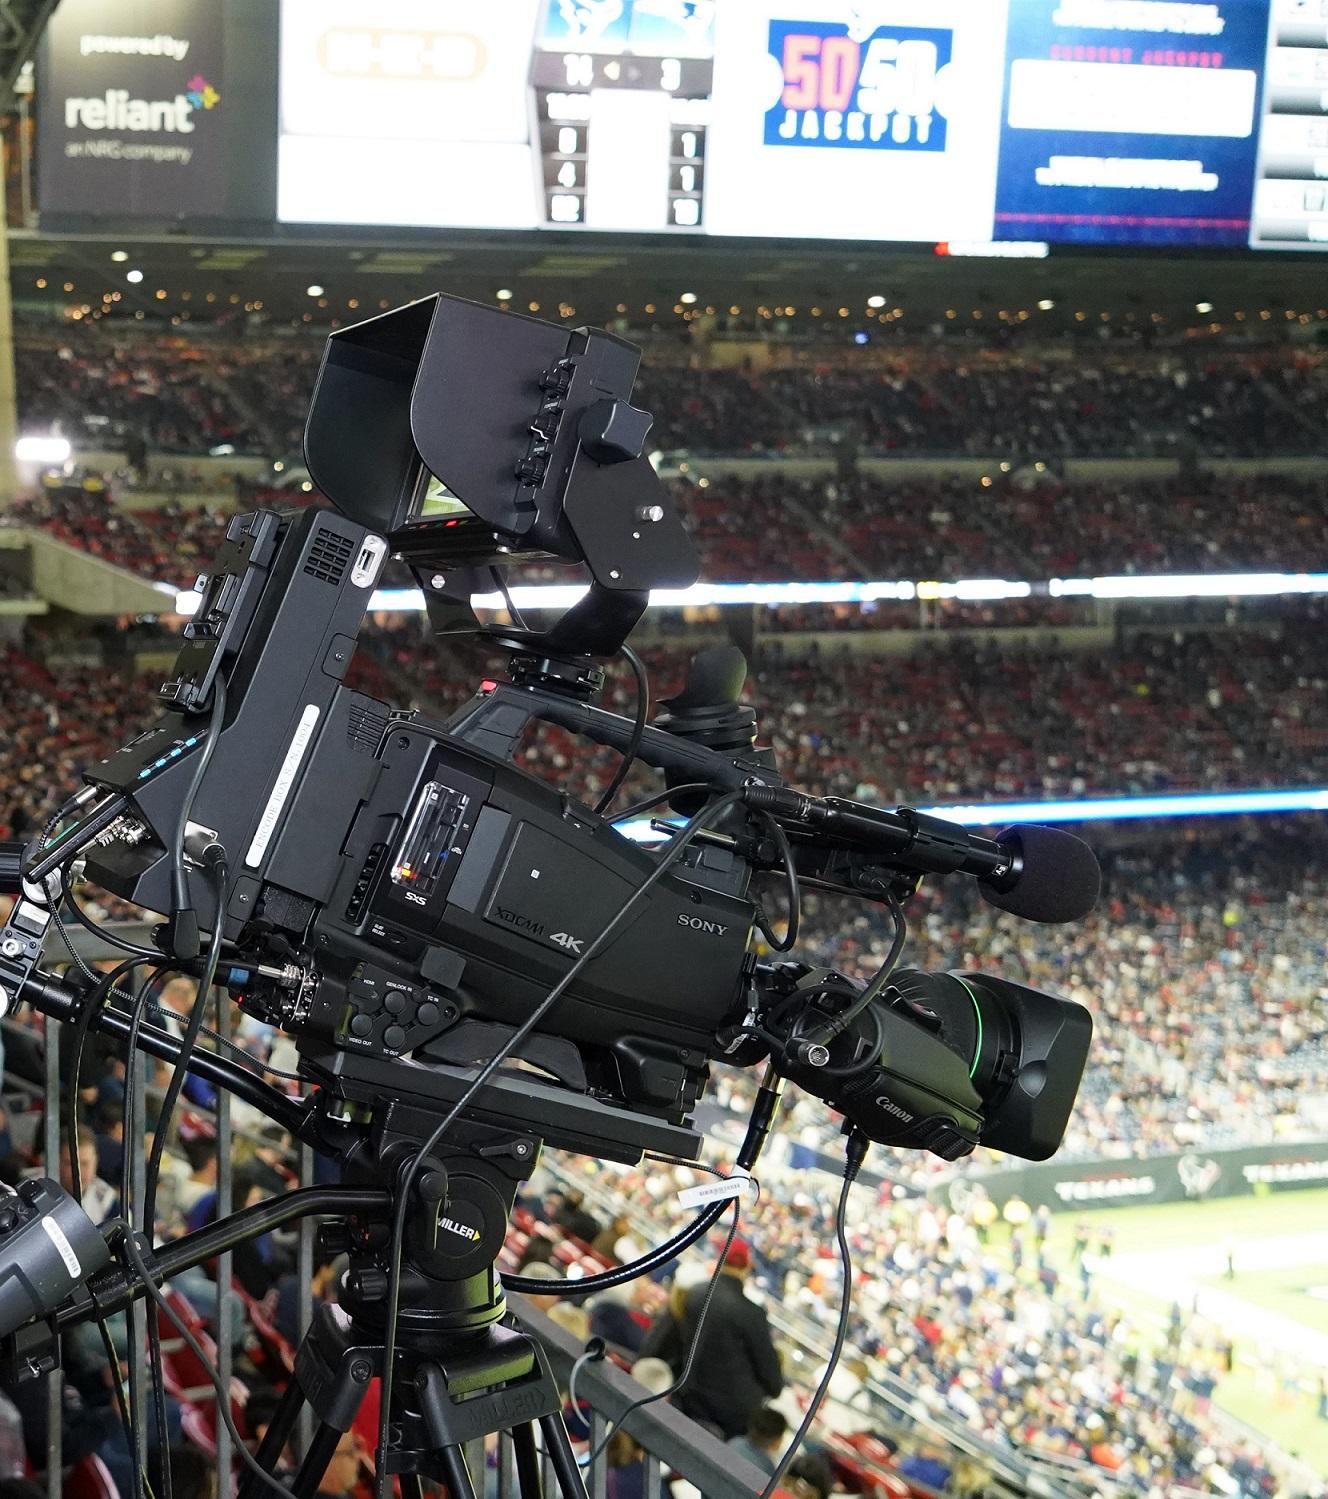 Sony專業攝影設備,搭配Xperia 5G手機